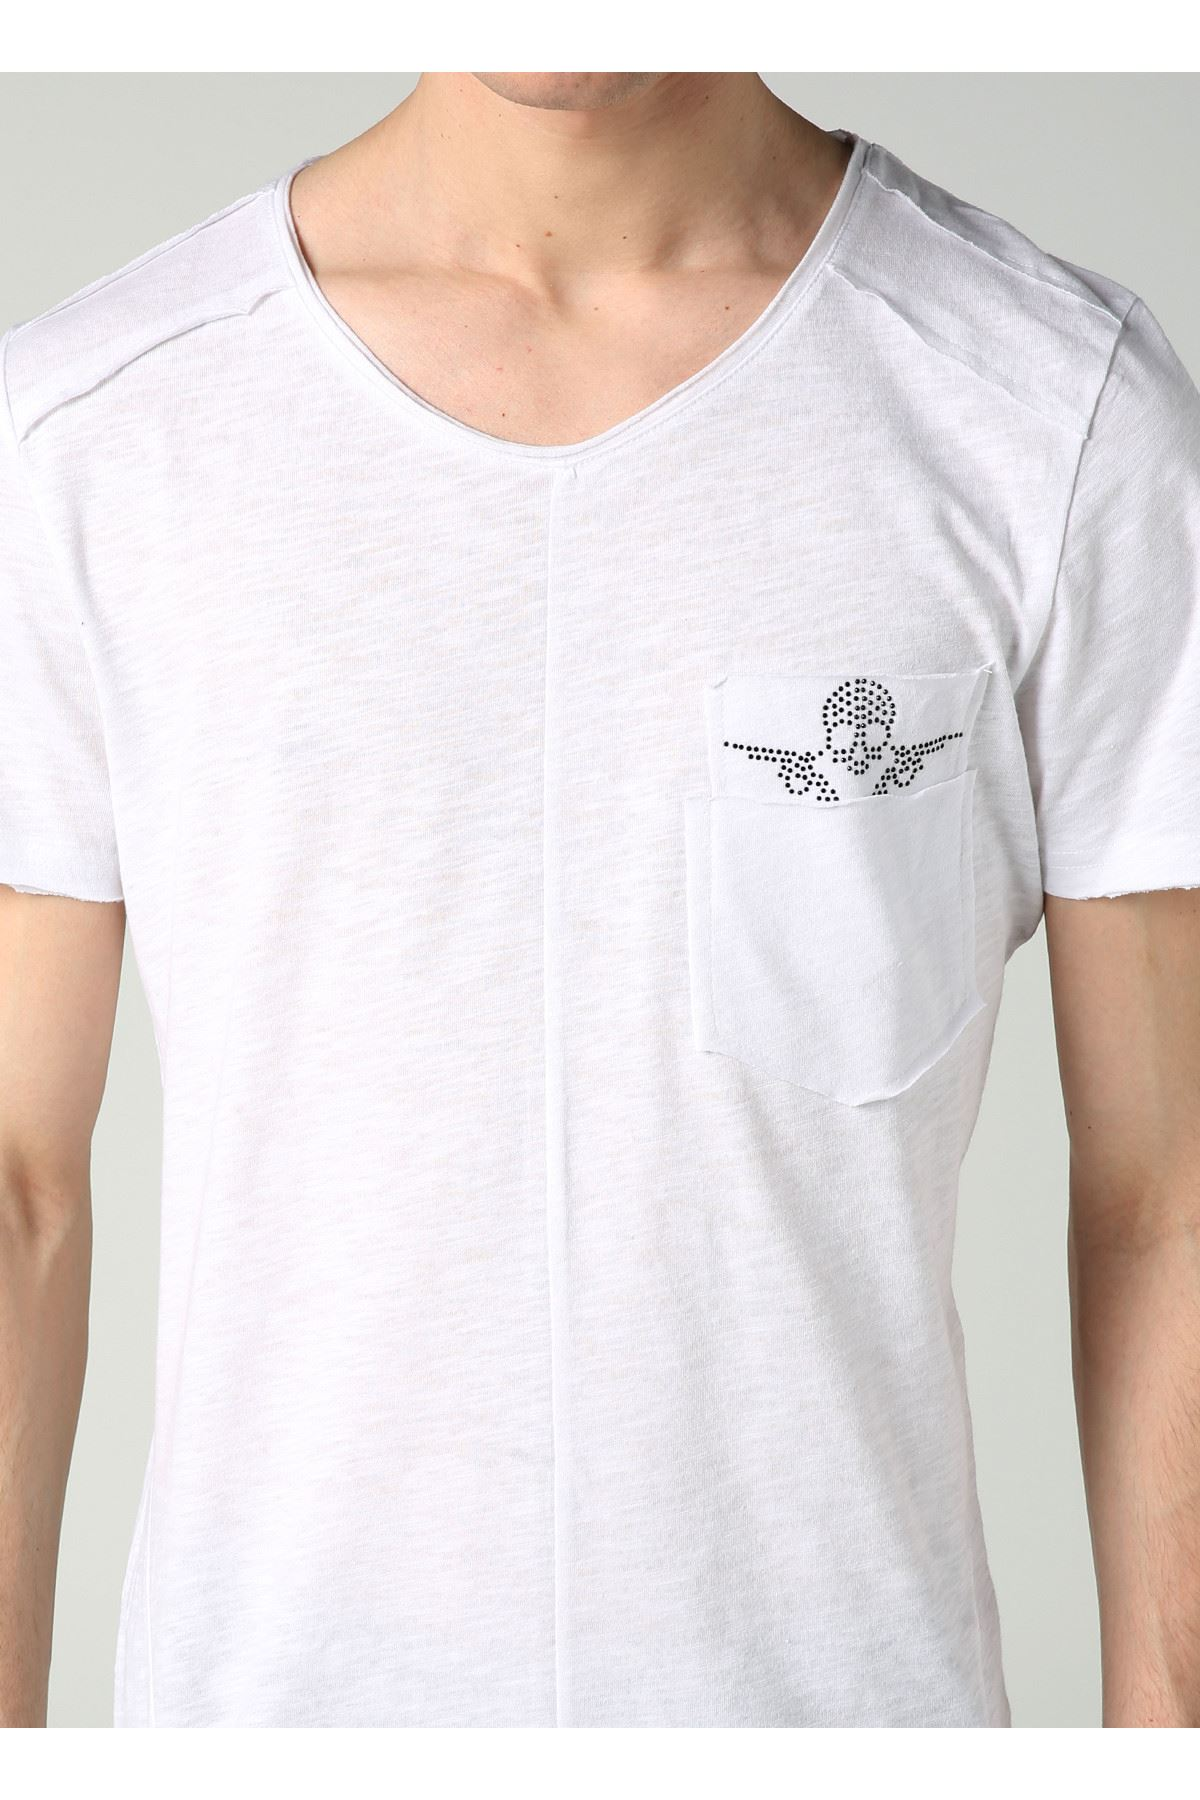 Bisiklet Yaka Cep Detay Beyaz Erkek T-Shirt